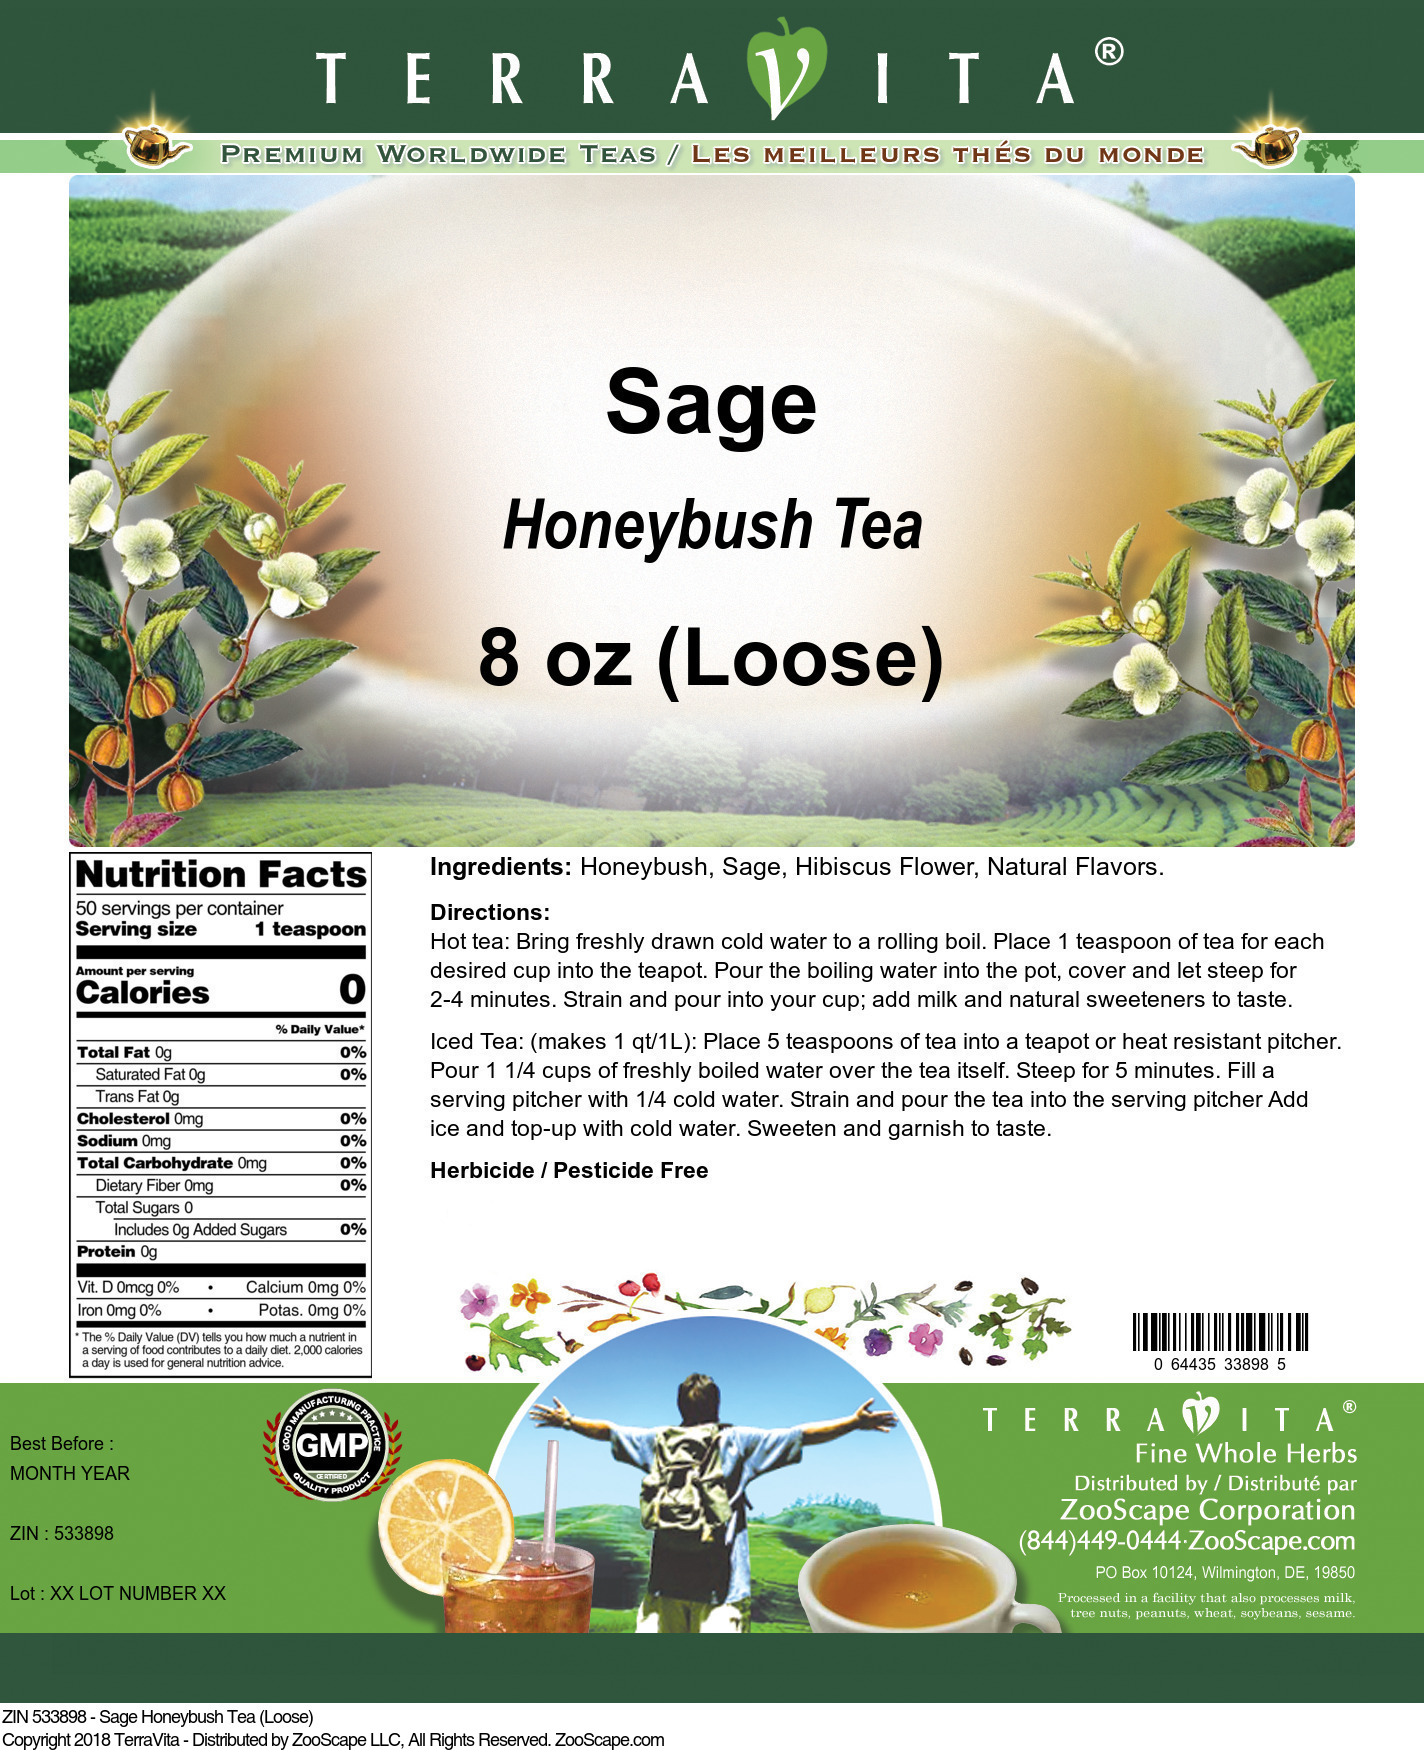 Sage Honeybush Tea